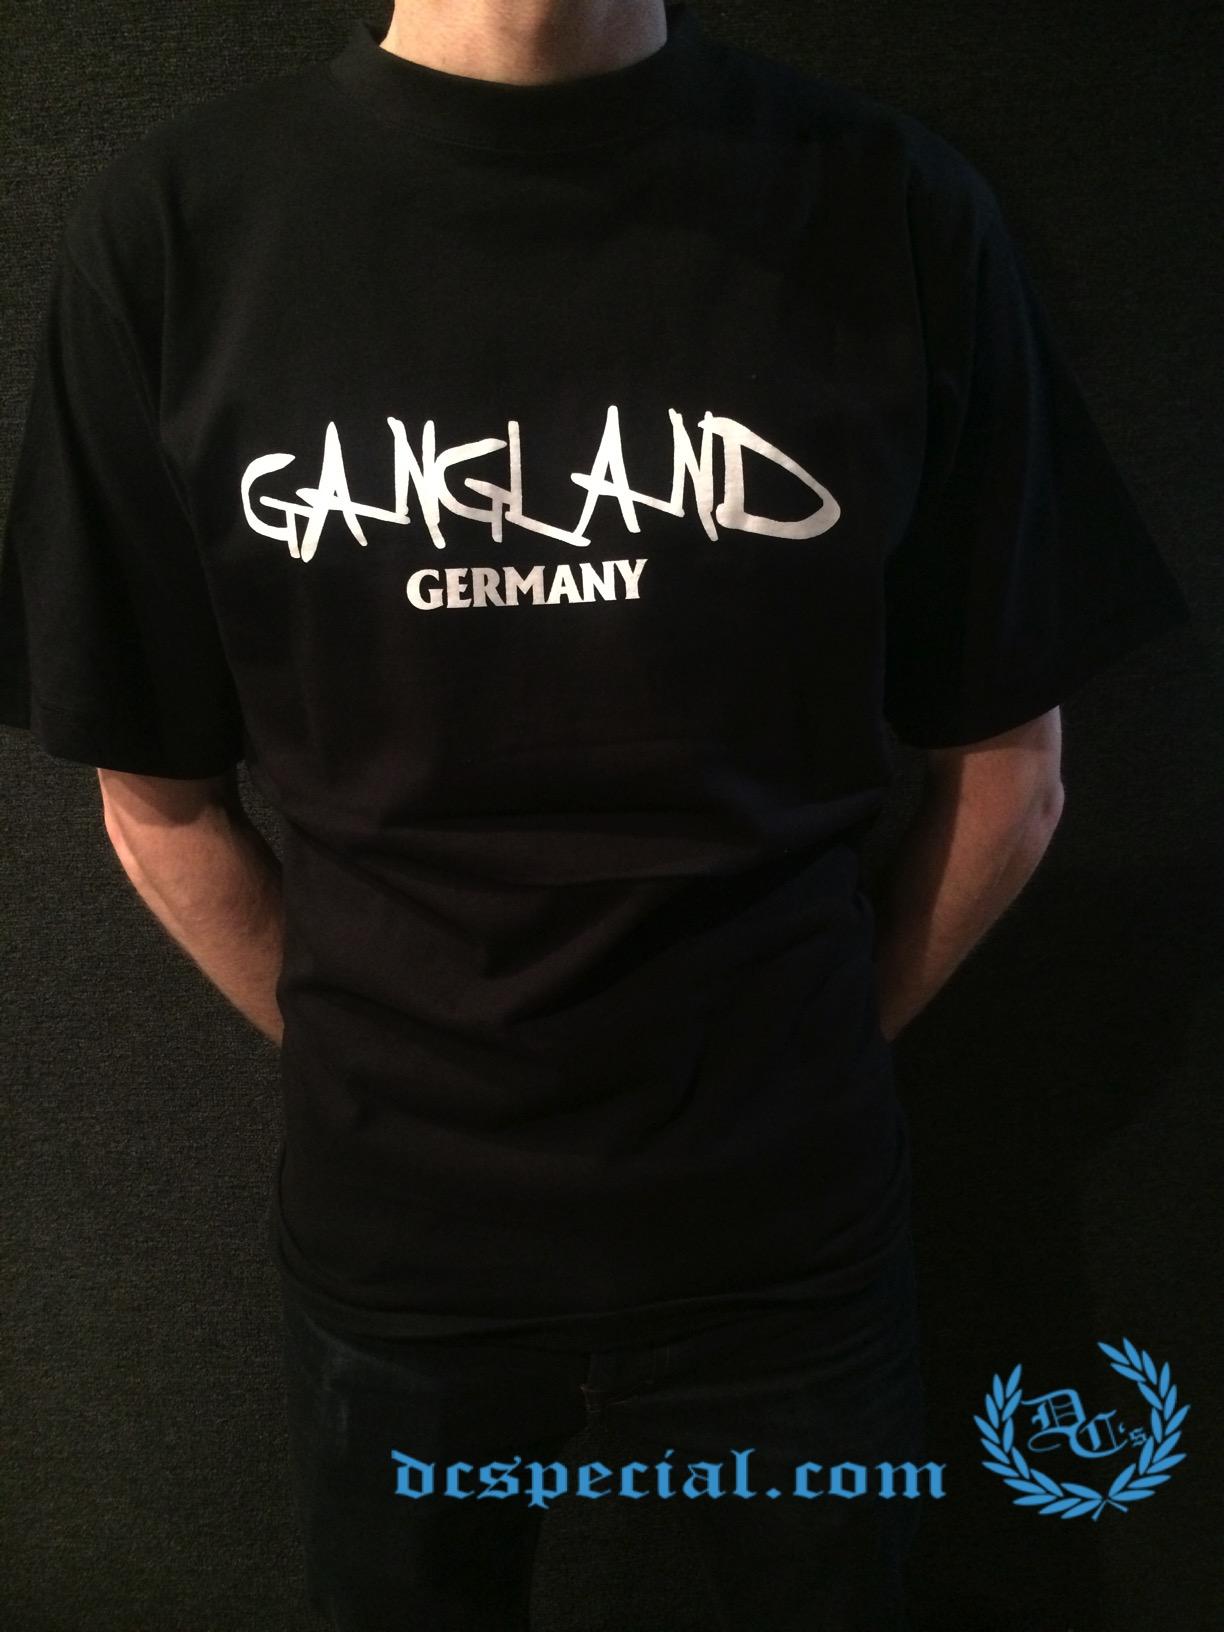 Gangland T-shirt 'Uzi Does It'